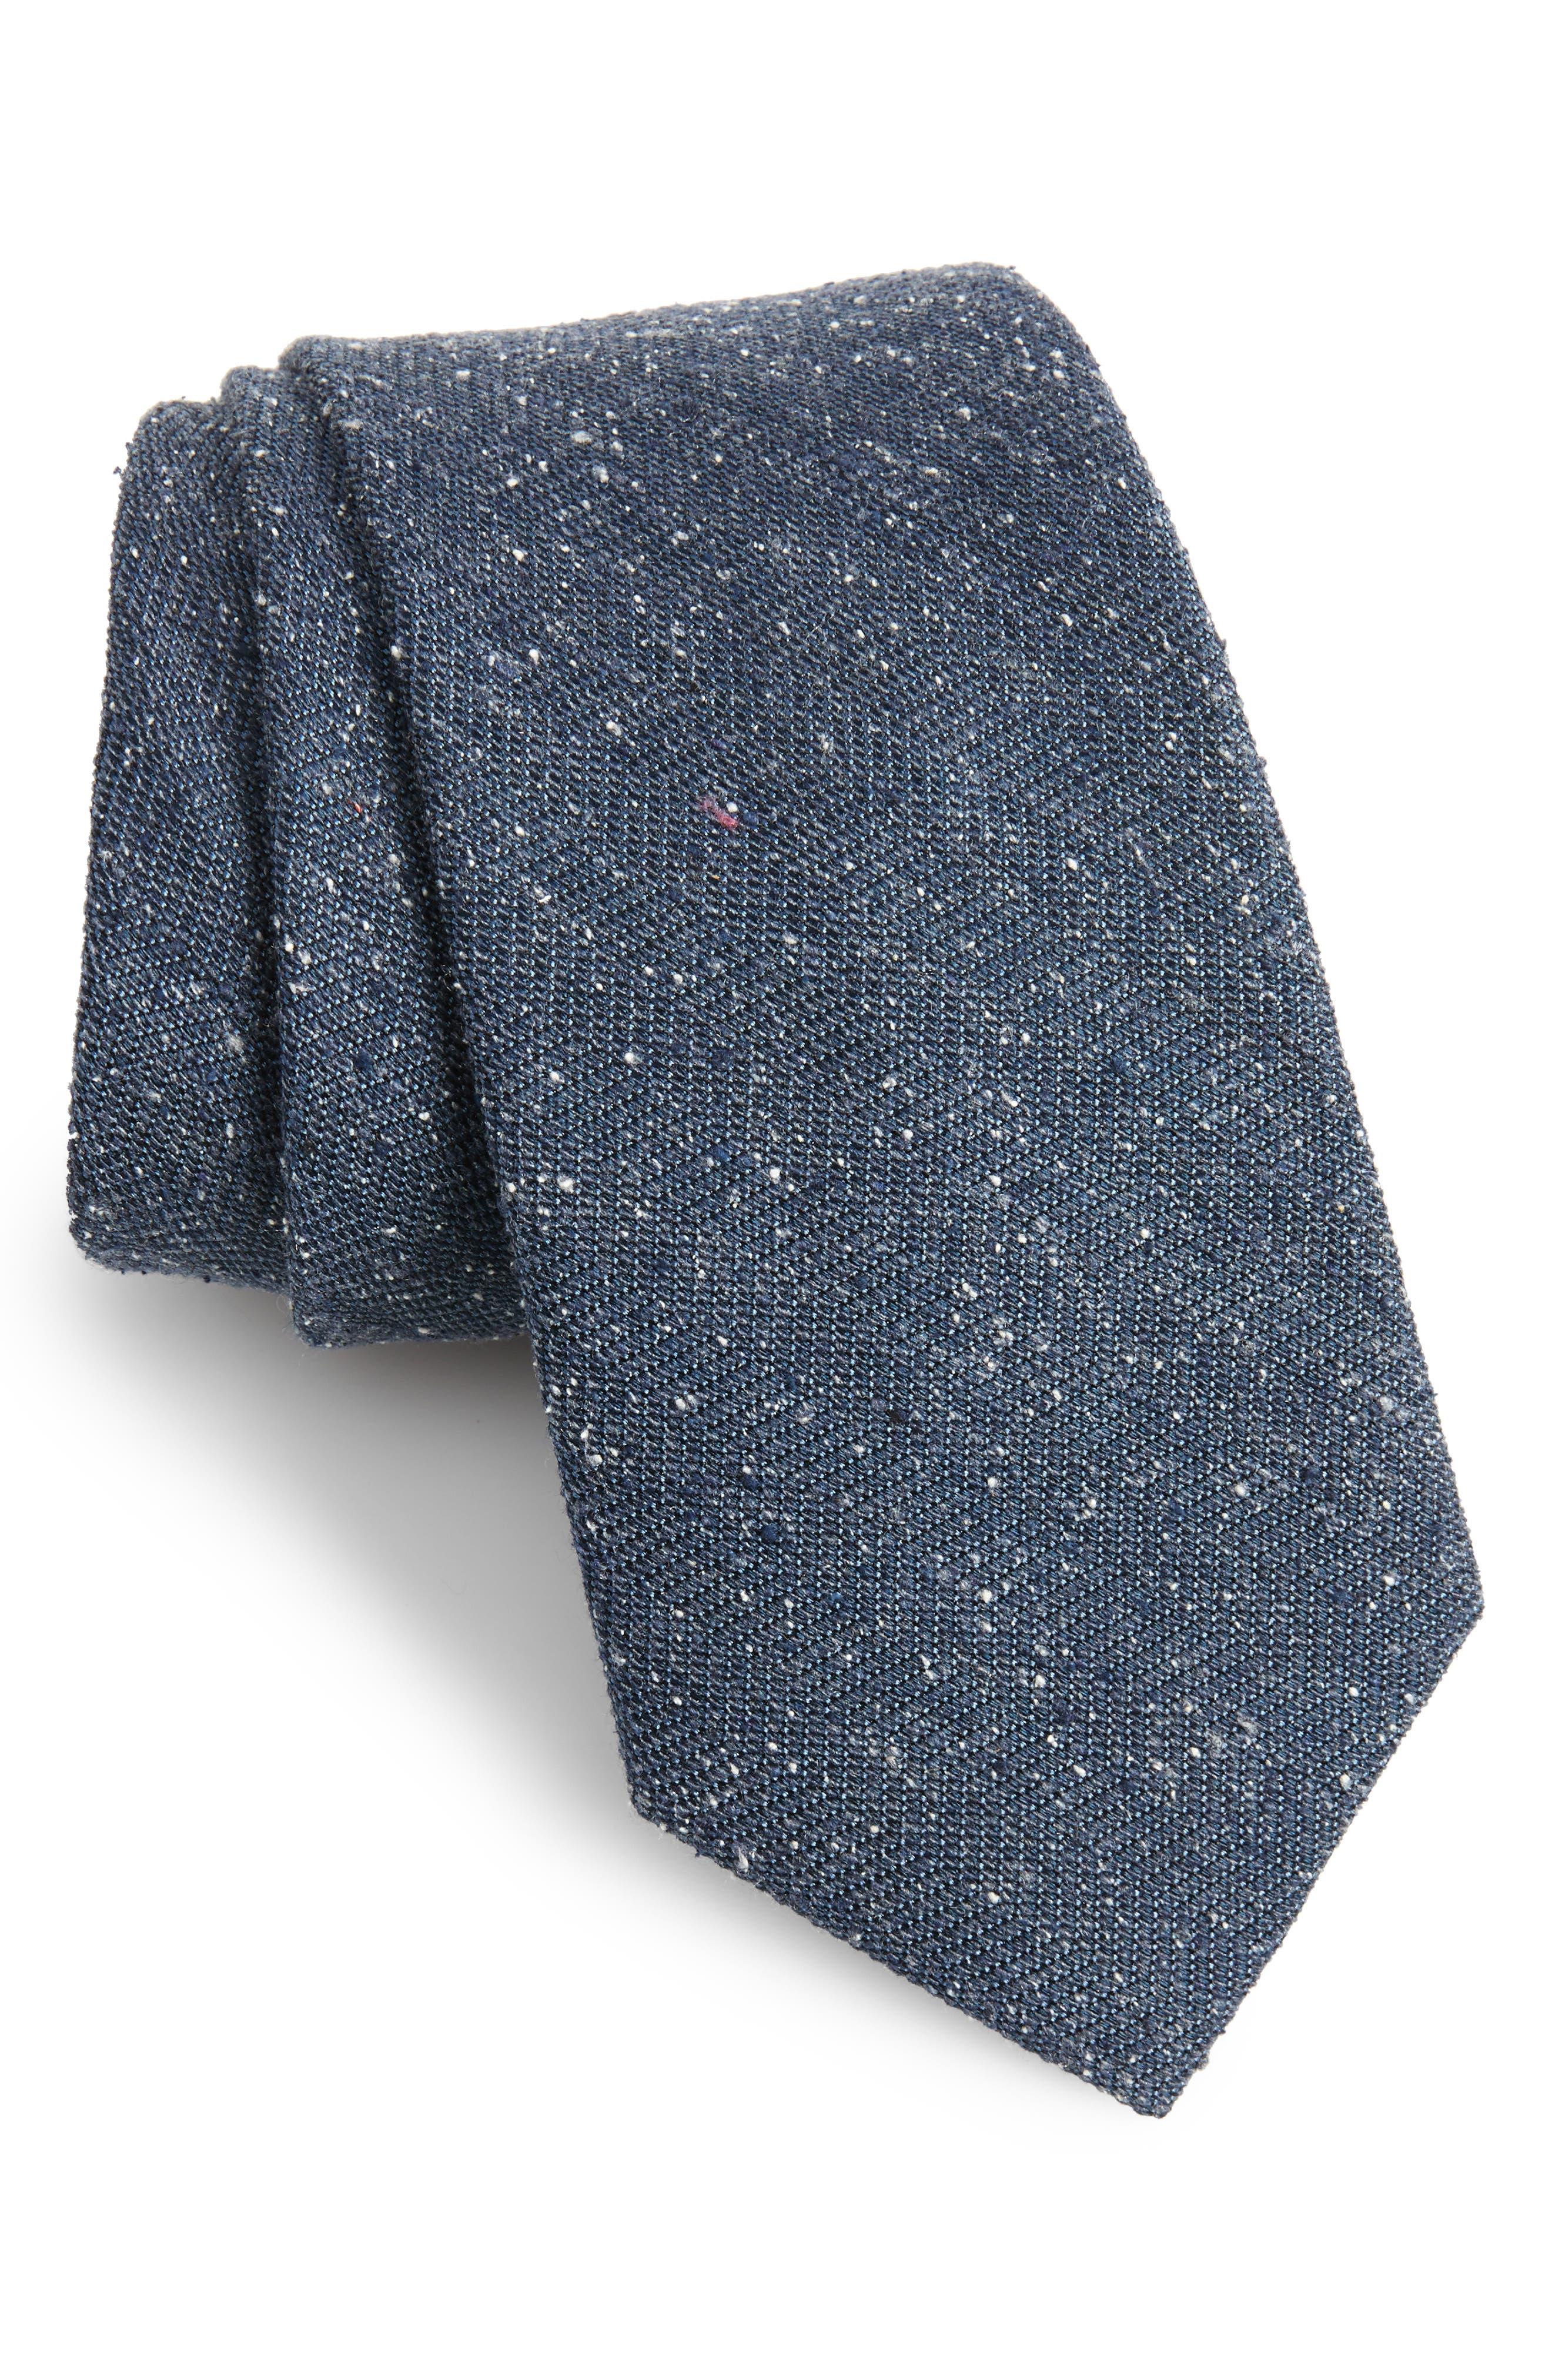 Herringbone Silk Tie,                             Main thumbnail 1, color,                             Navy